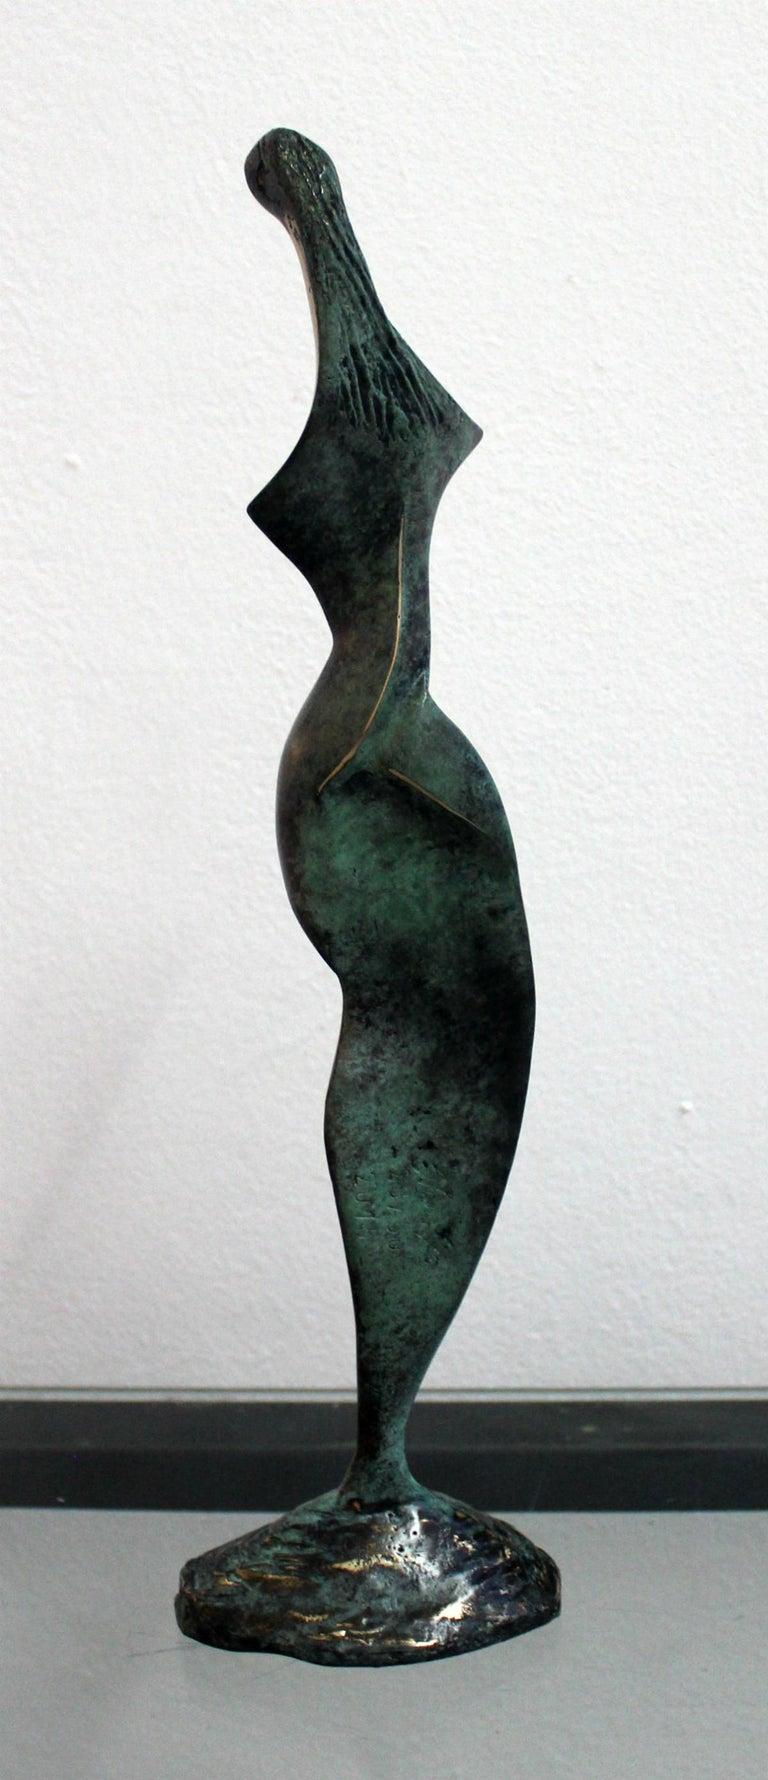 Dame - XXI Century, Contemporary Bronze Sculpture, Abstract, Figurative, Nude - Gold Figurative Sculpture by Stanisław Wysocki